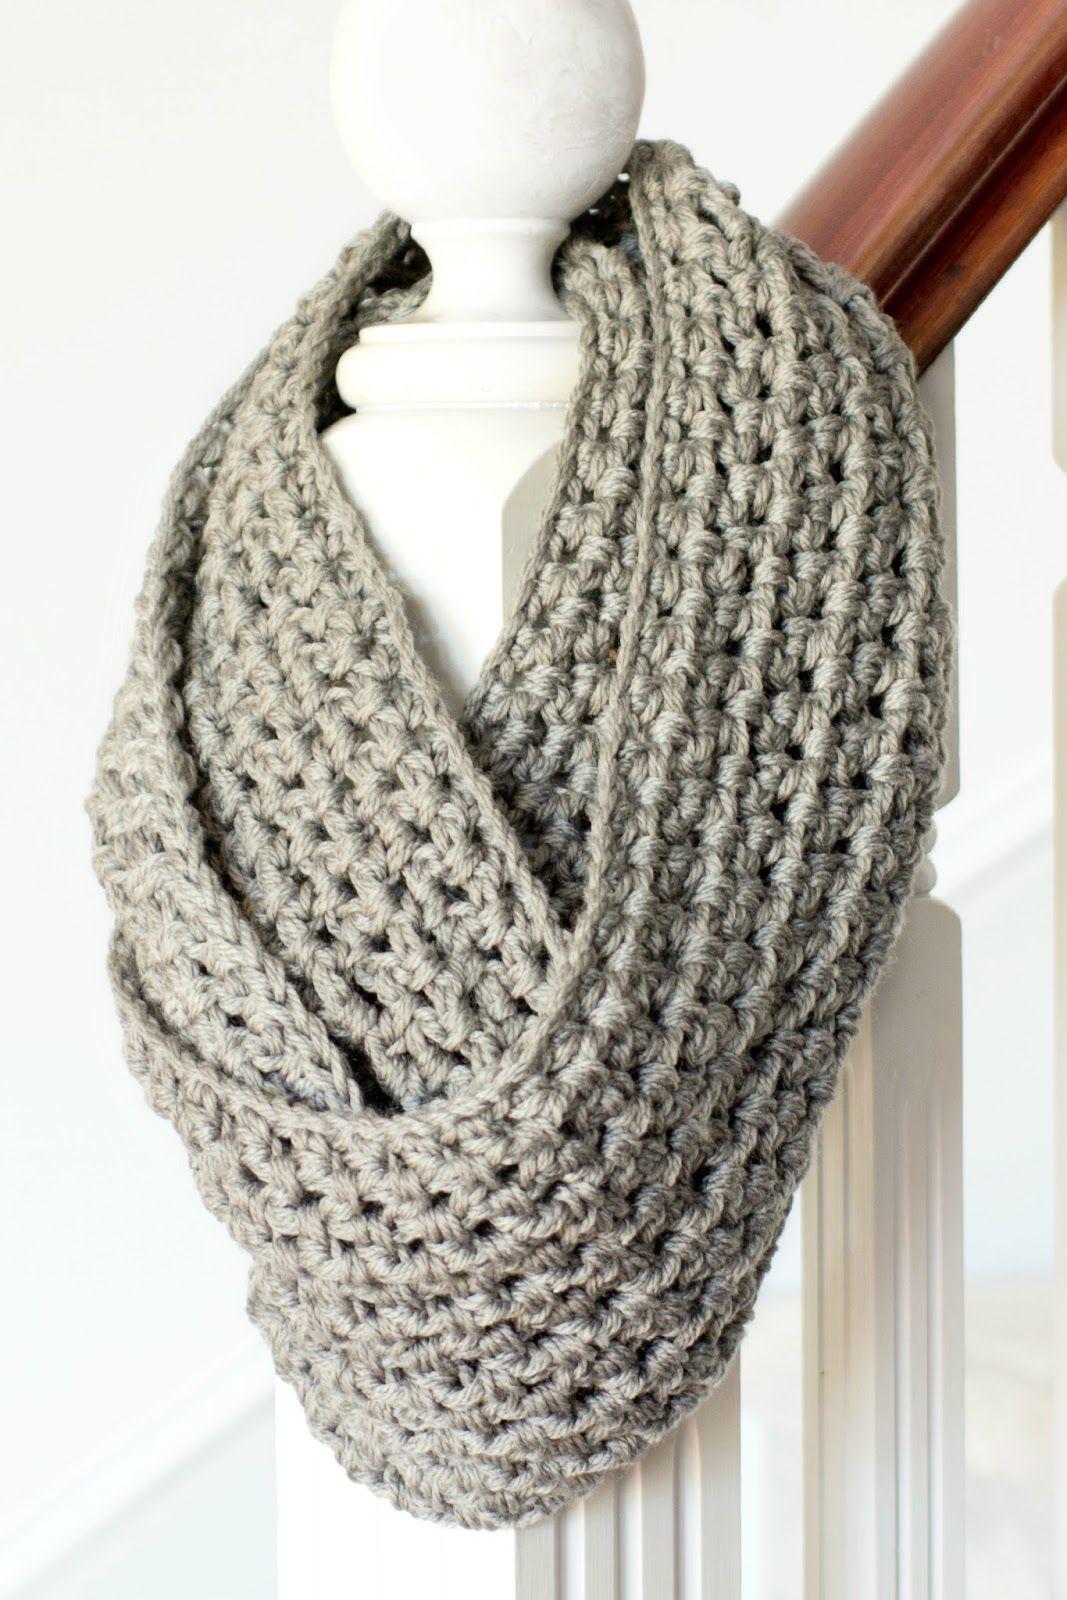 Basic Chunky Infinity Scarf Crochet Pattern | Bufandas infinito ...